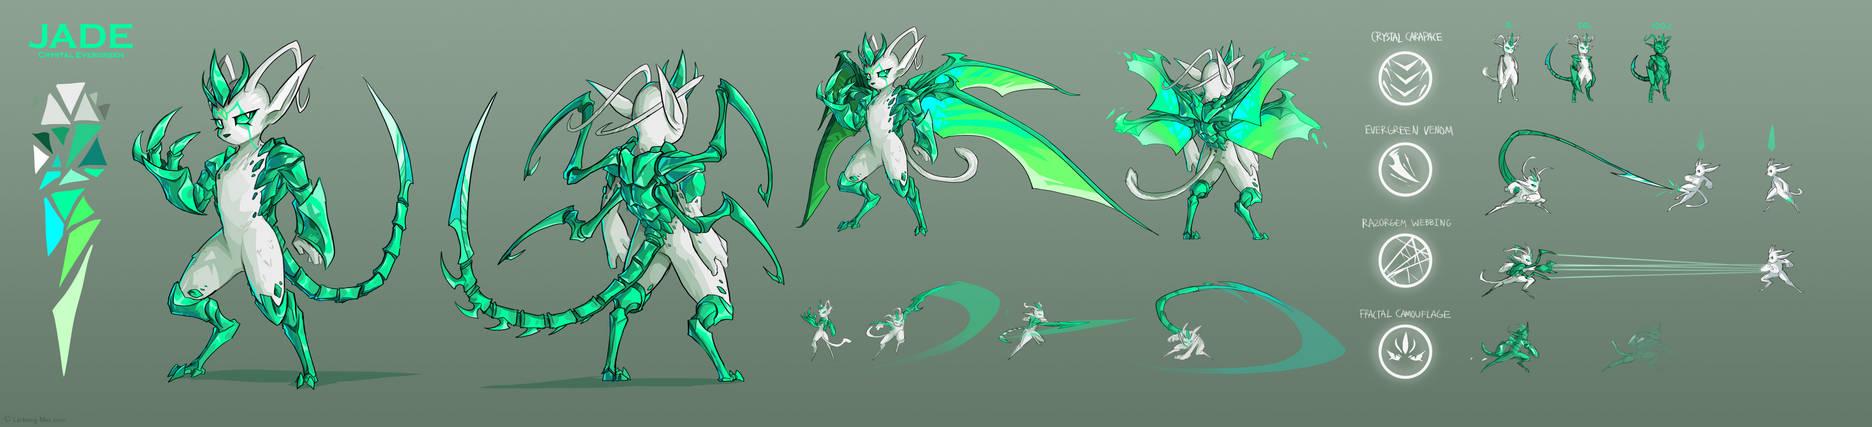 Jade, The Crystal Evergreen Ref Sheet